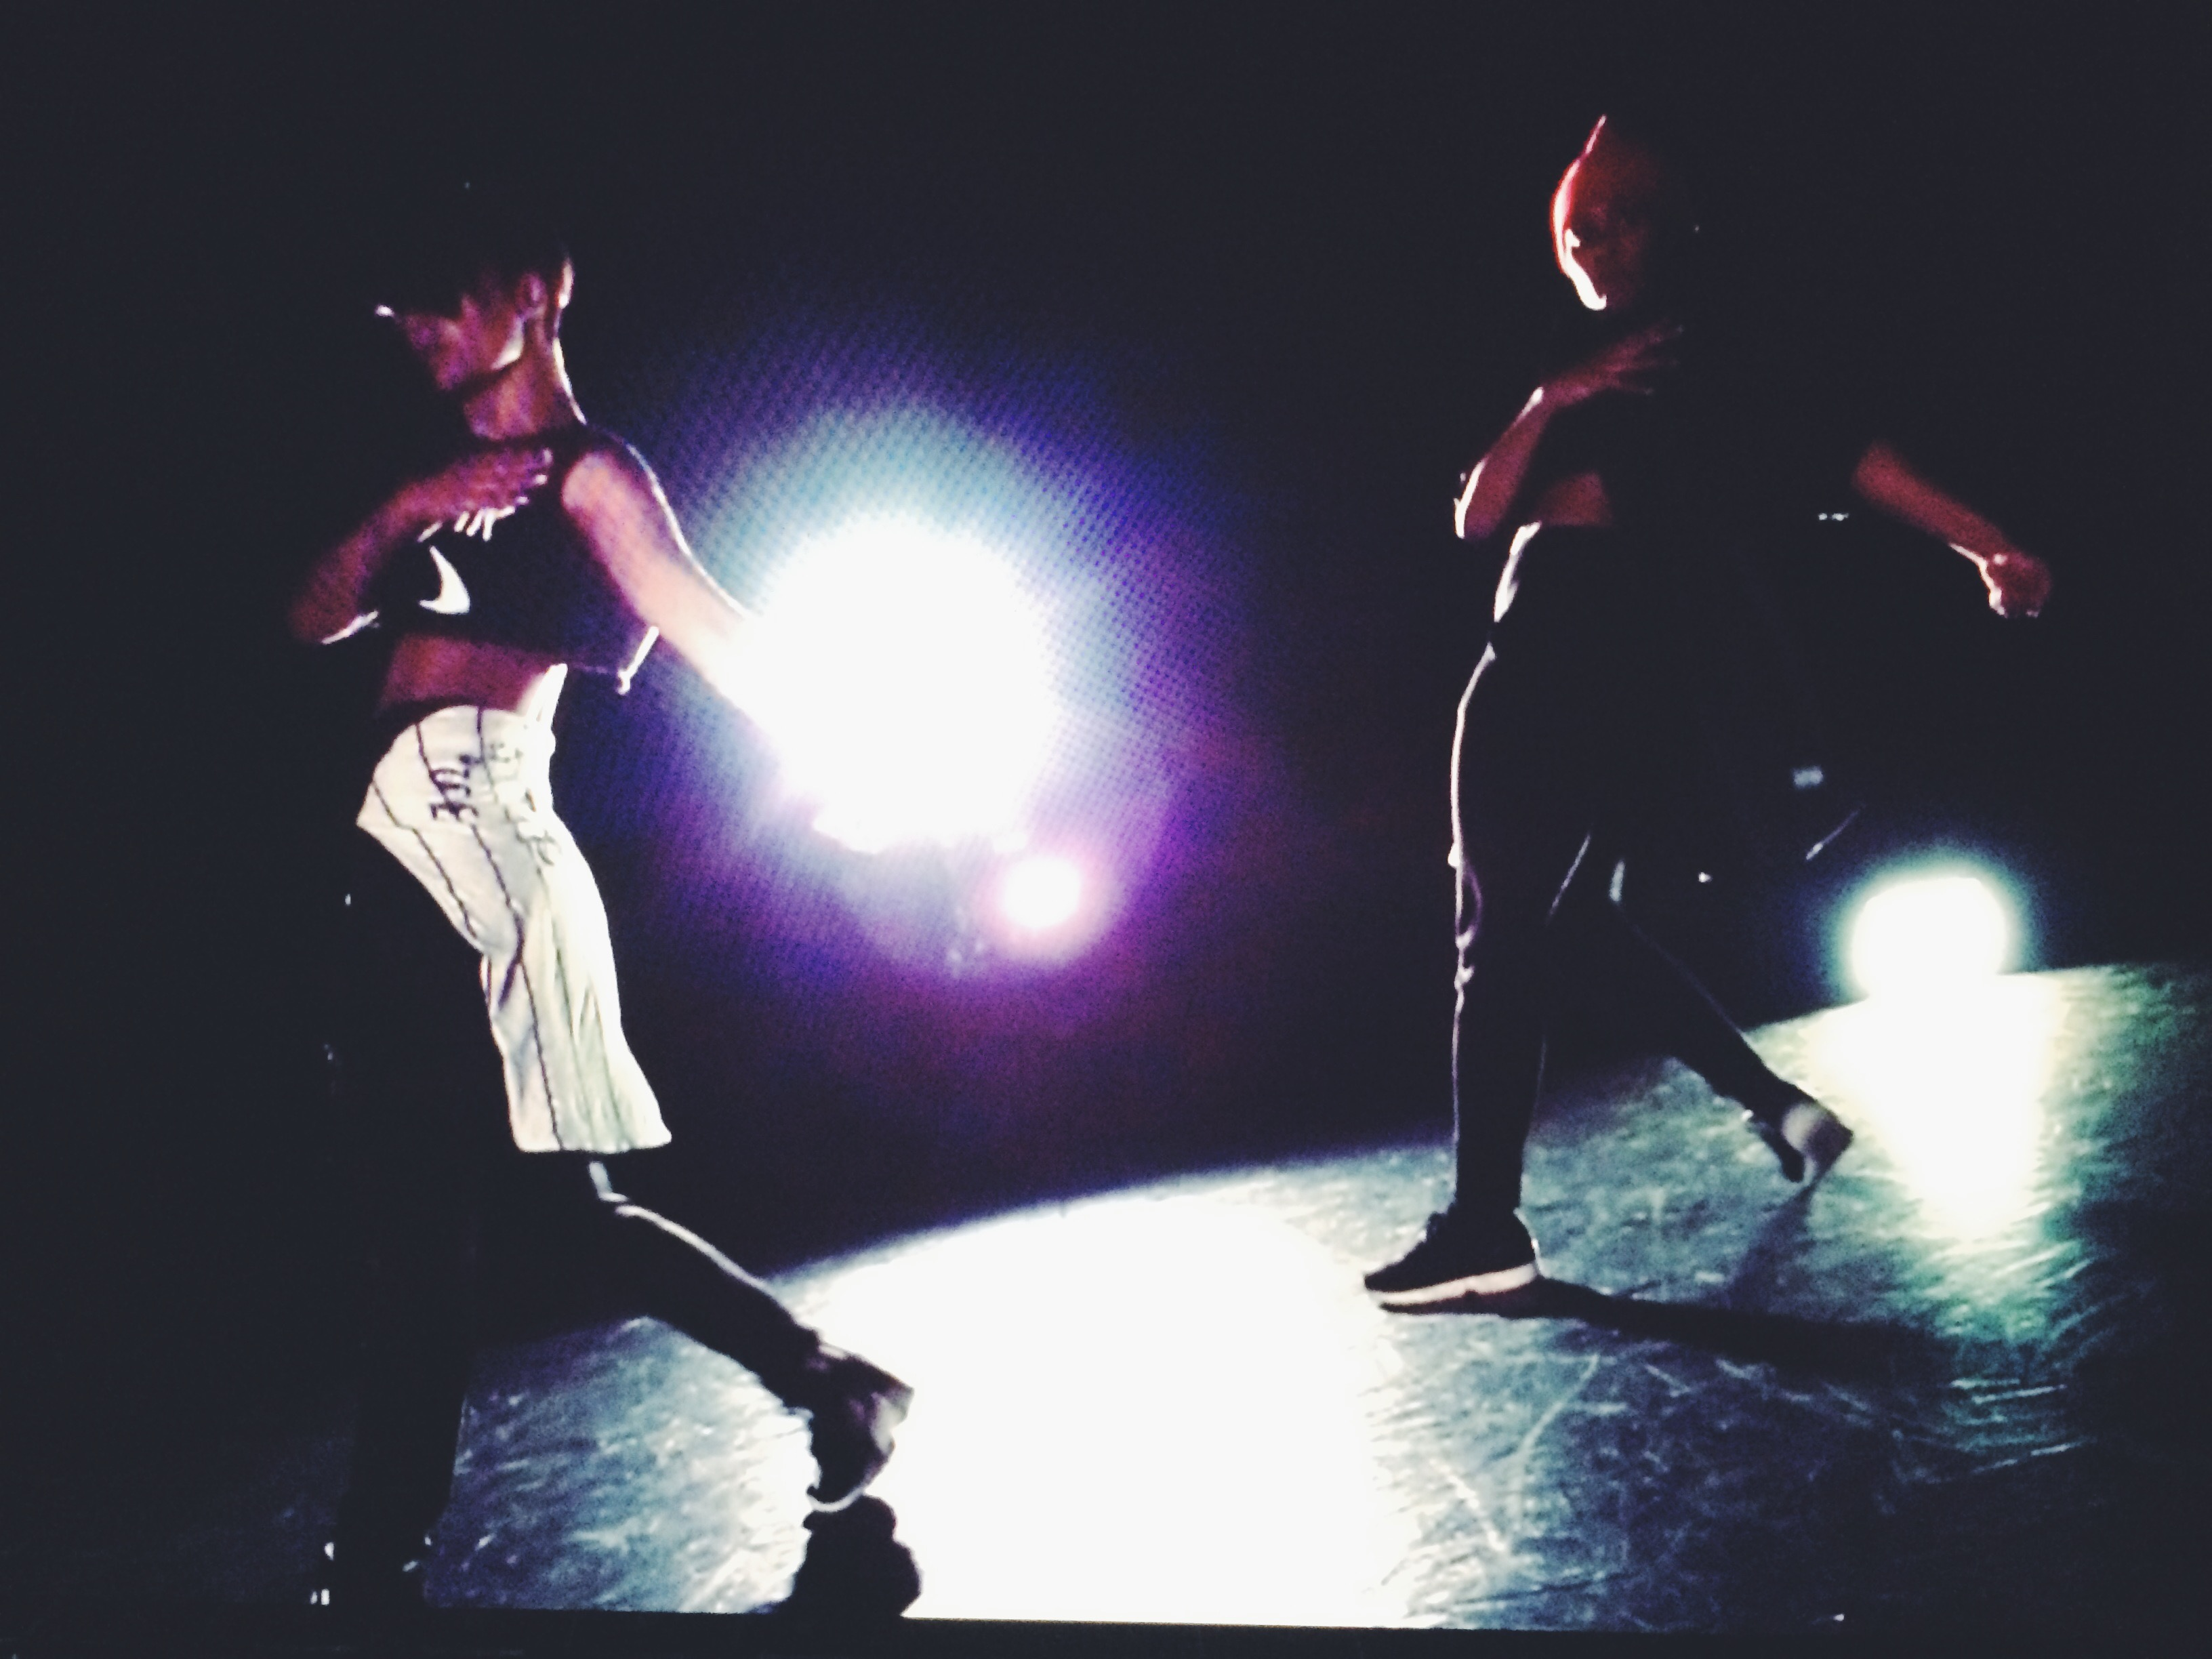 Sara Jordan,danser,koreograf